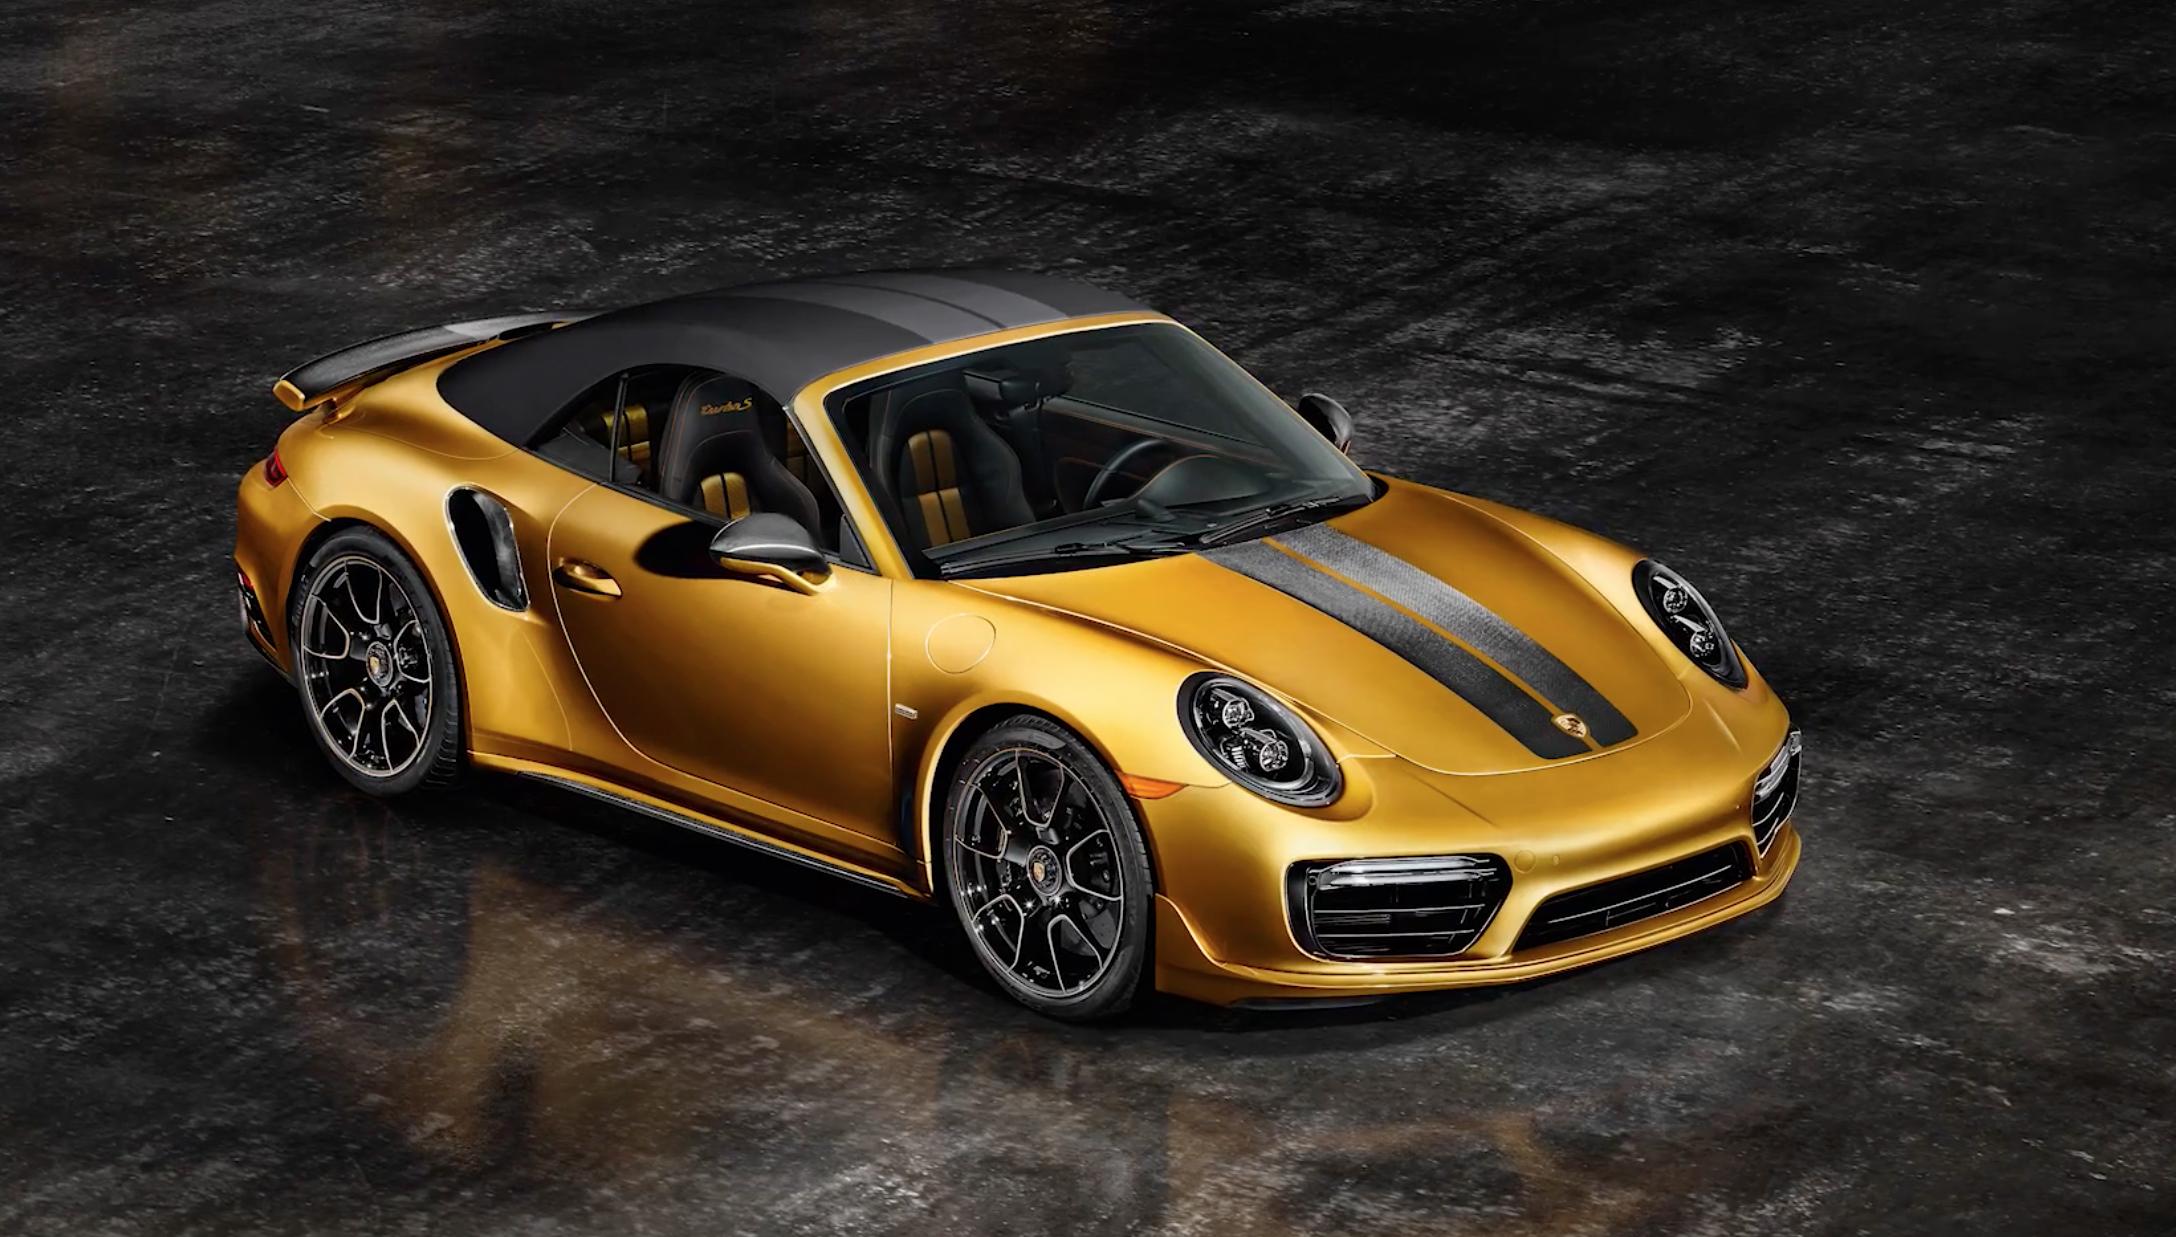 Porsche 911 Turbo s exclusive series Cabriolet